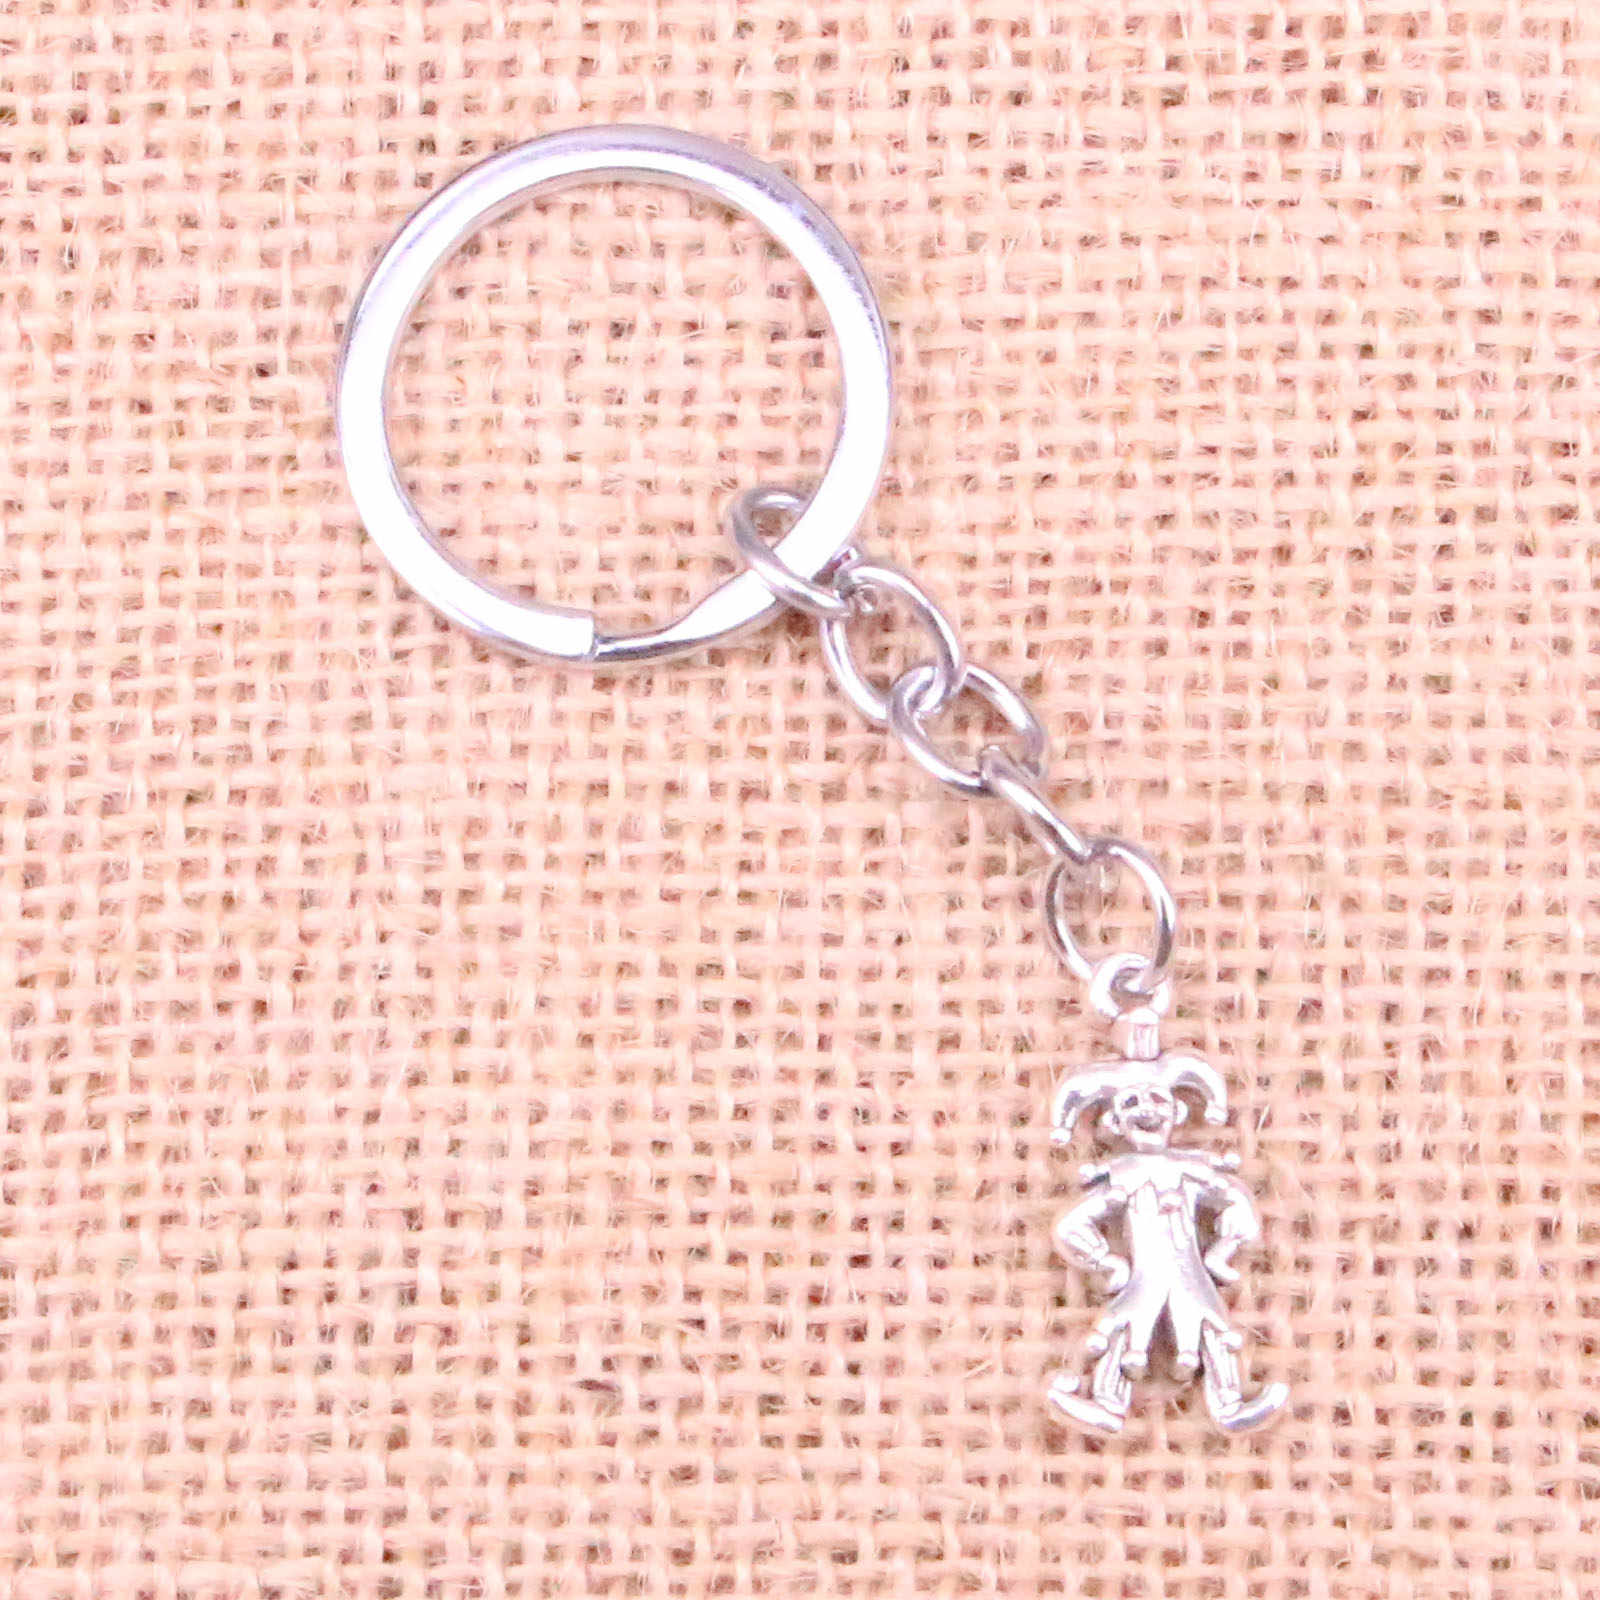 Car Key wisiorek obrączka srebrny kolor Metal breloczki akcesoria hurtownia, Vintage clown joker jester brelok